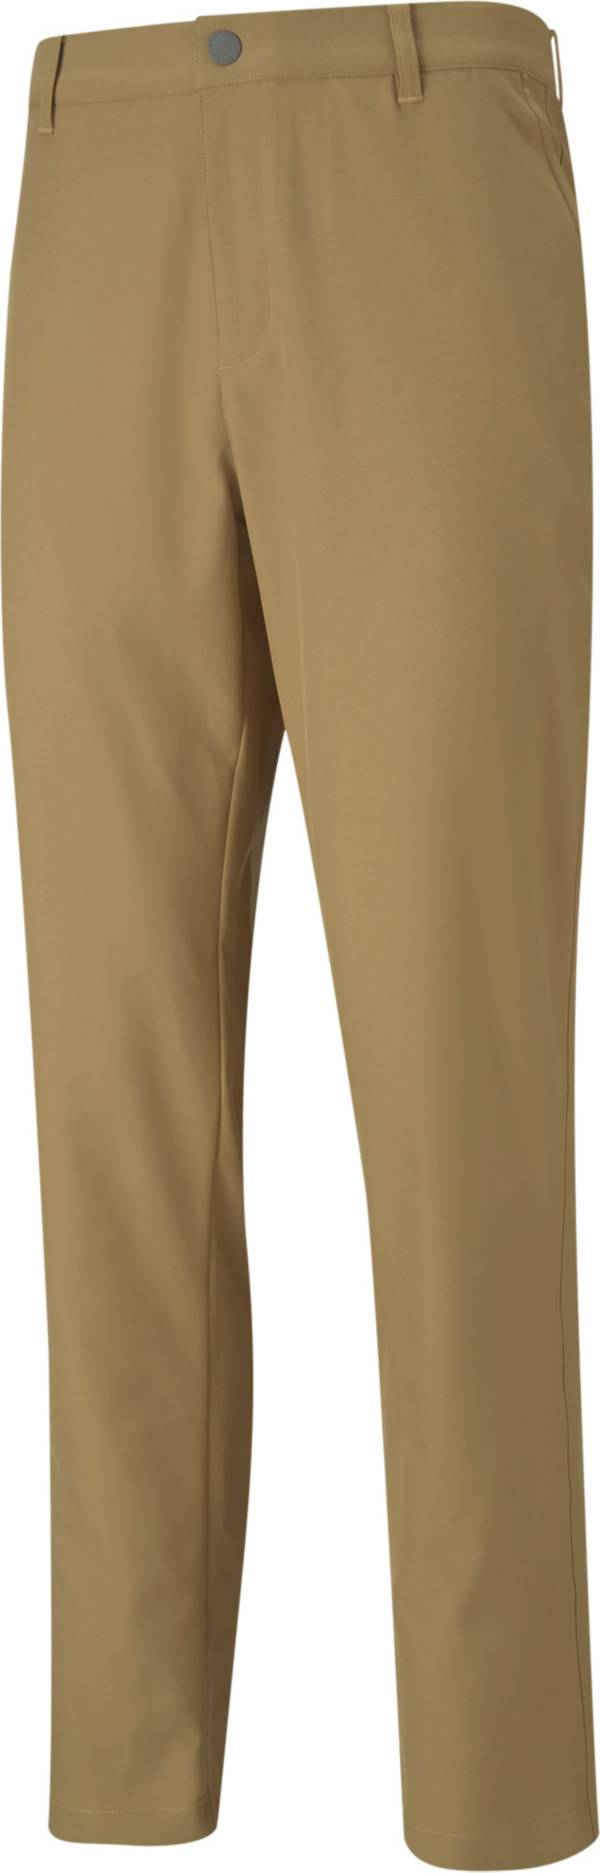 Puma Men's Jackpot Golf Pants product image